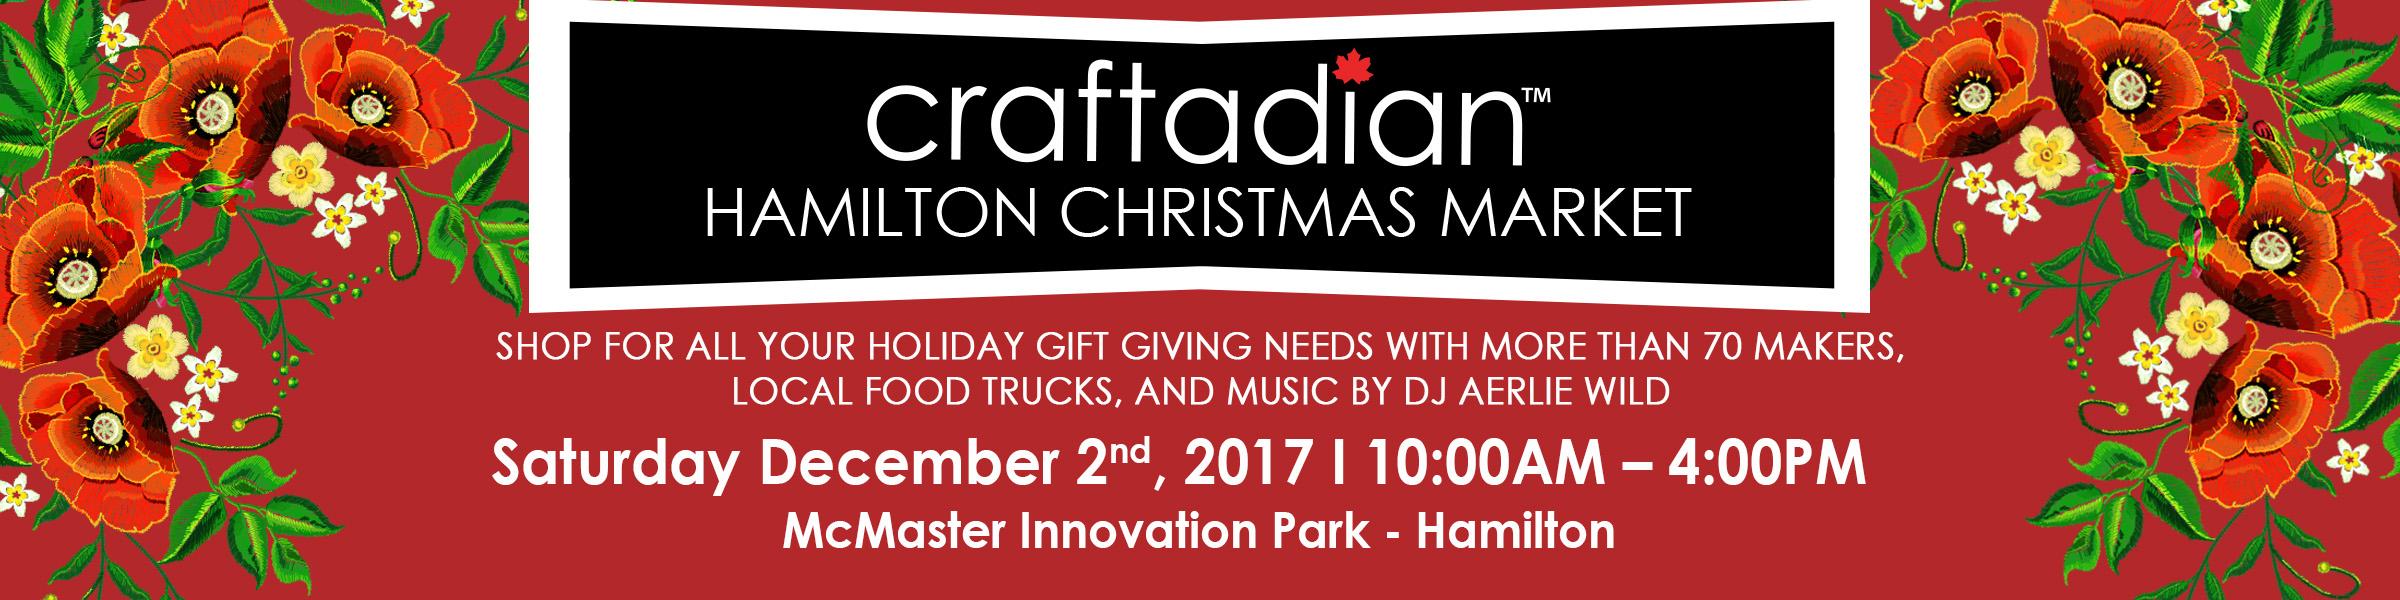 Hamilton Christmas Market.Craftadian Hamilton Craftadian Christmas